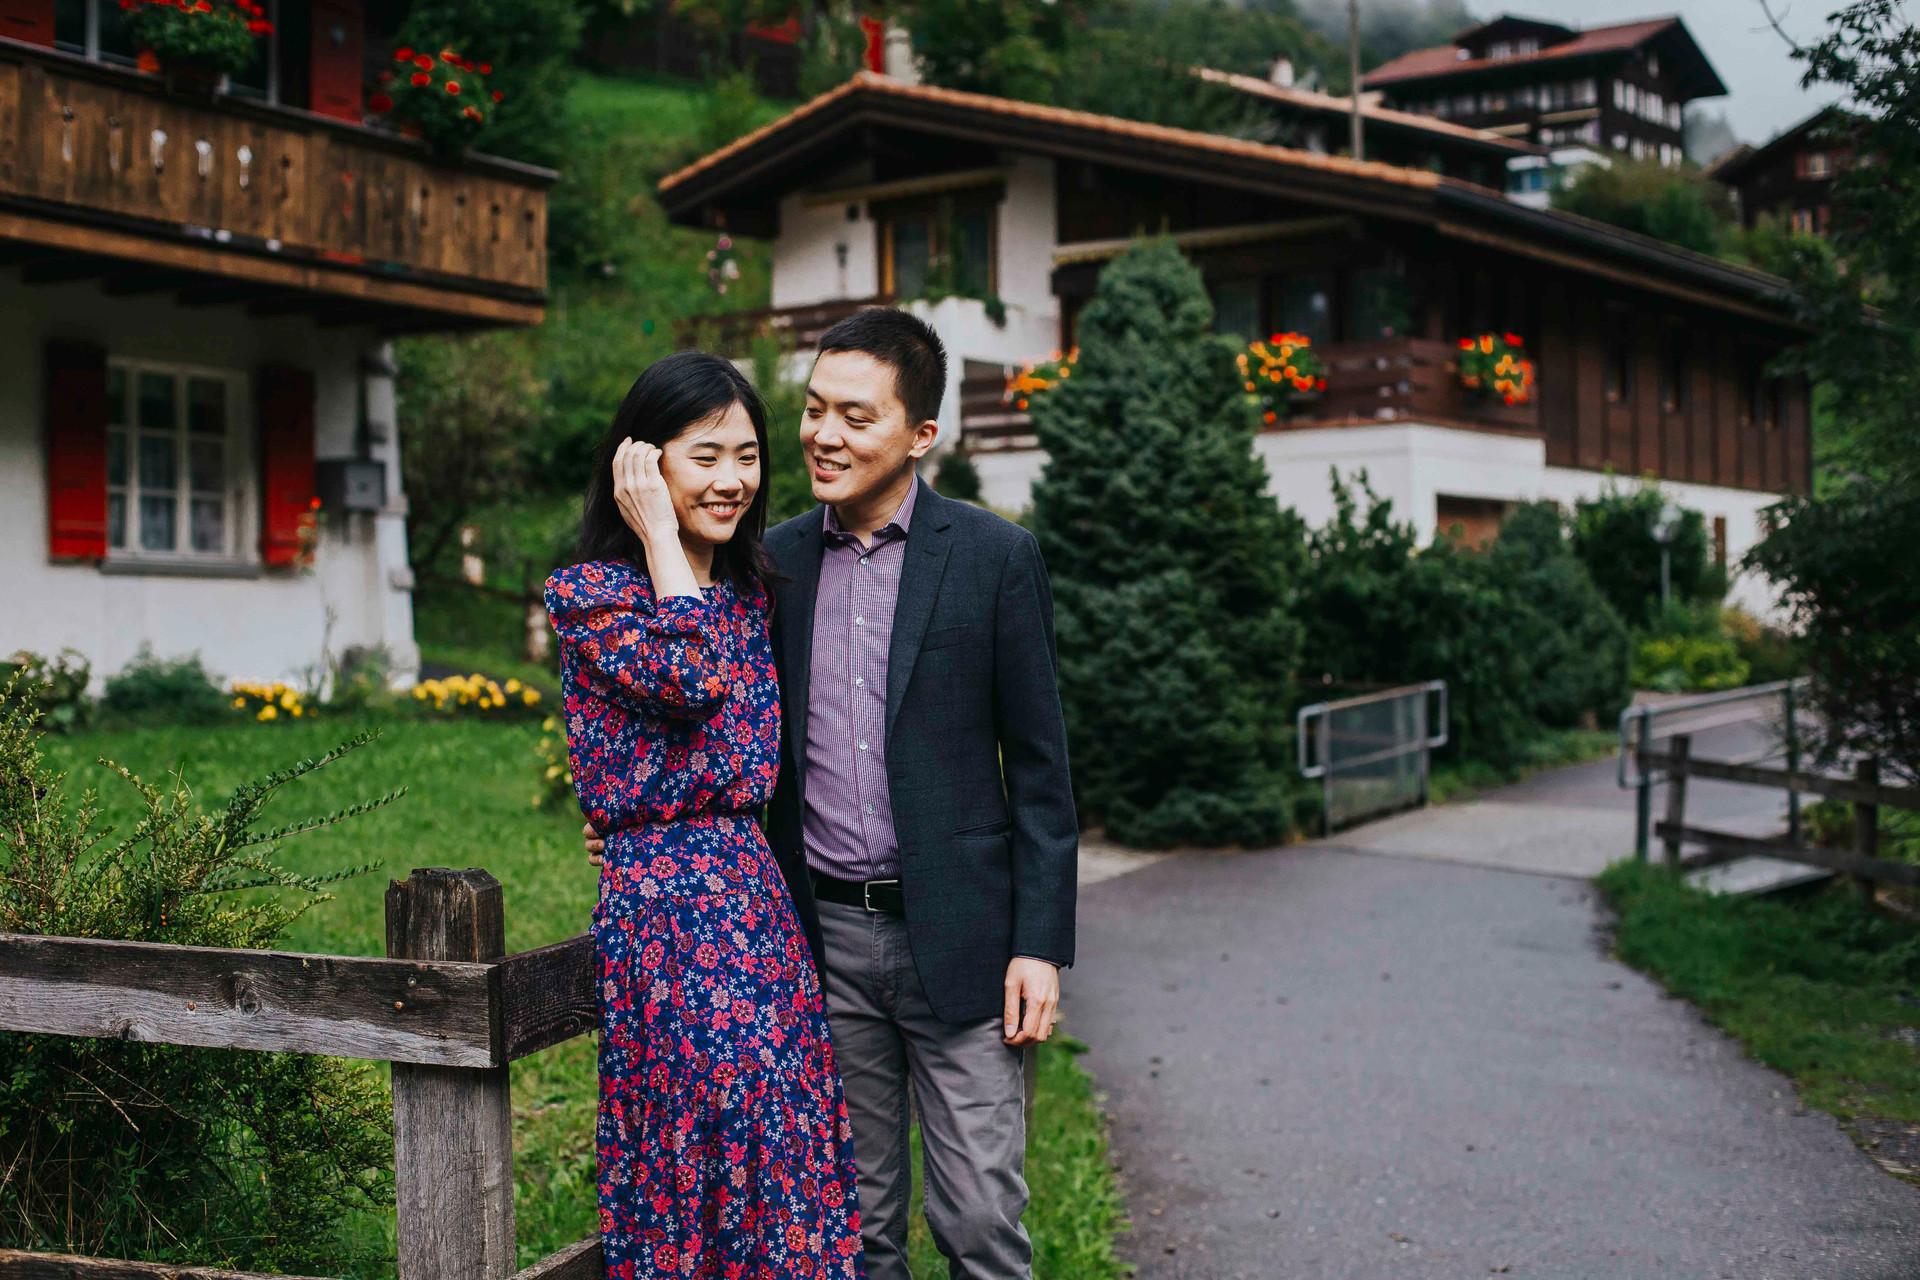 Lauterbrunnen photo session-17.jpg